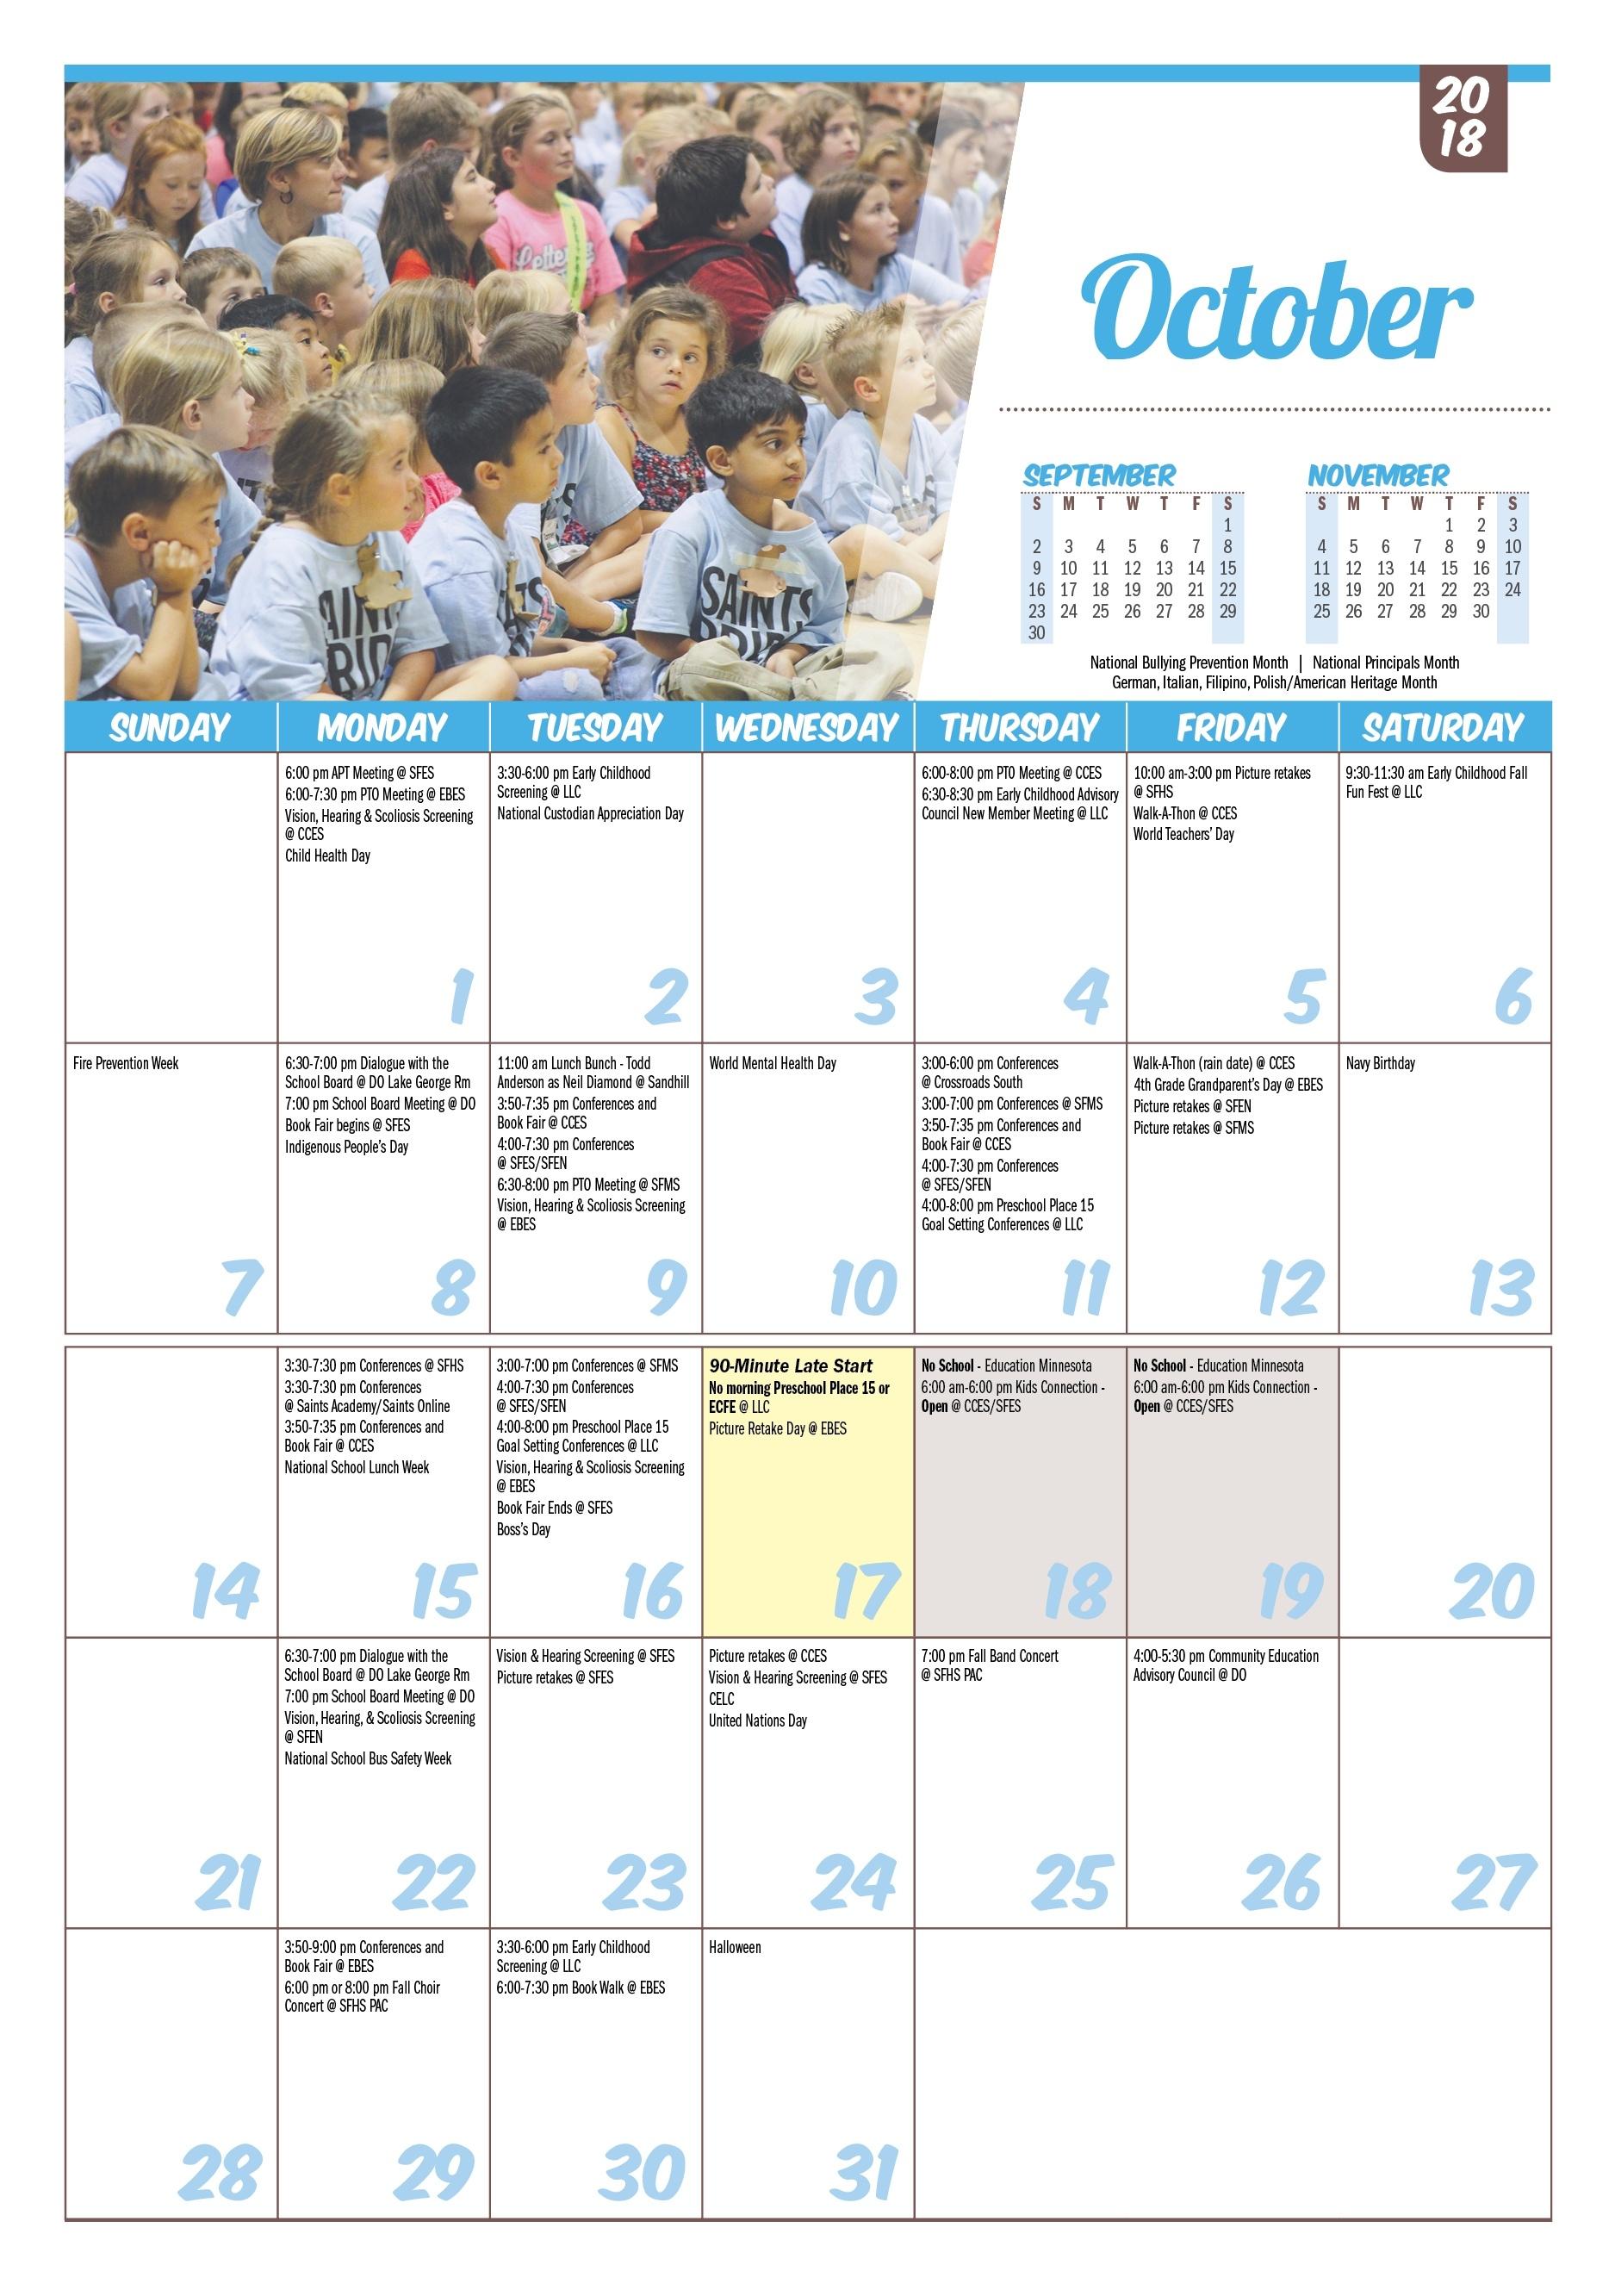 Isd 15, St. Francis: Printable Calendars_Anderson 5 School Calendar